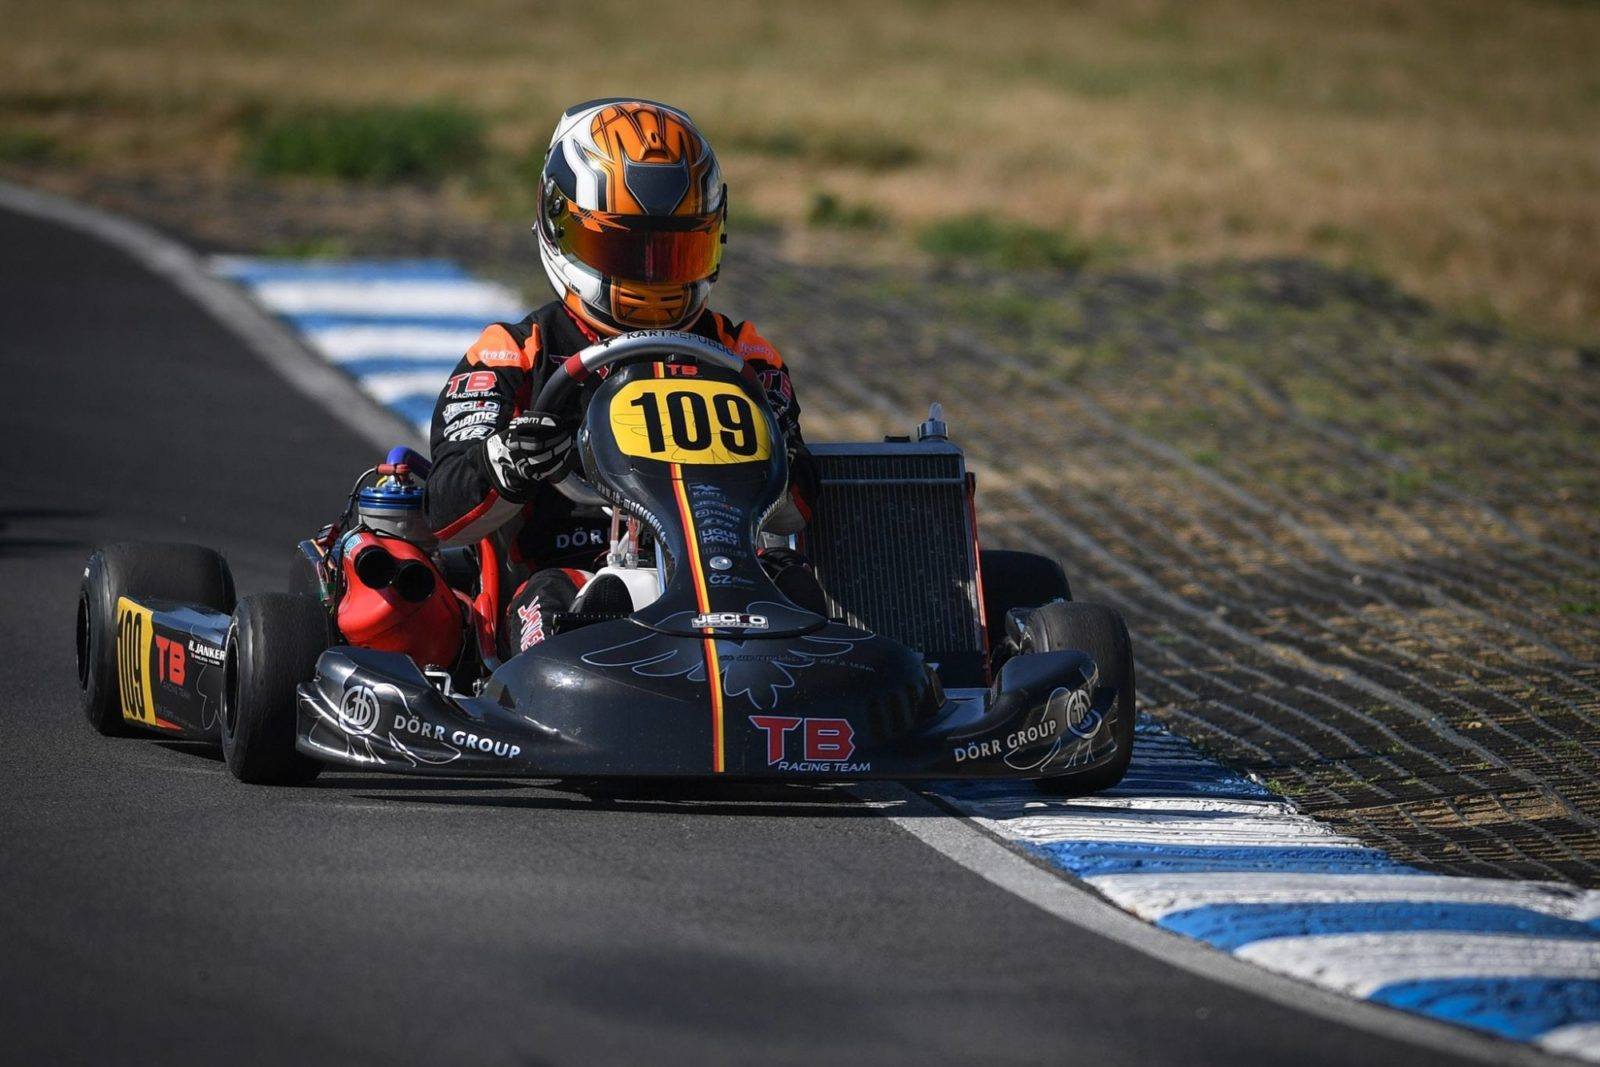 Hannes Janker aboard his Kart Republic machine